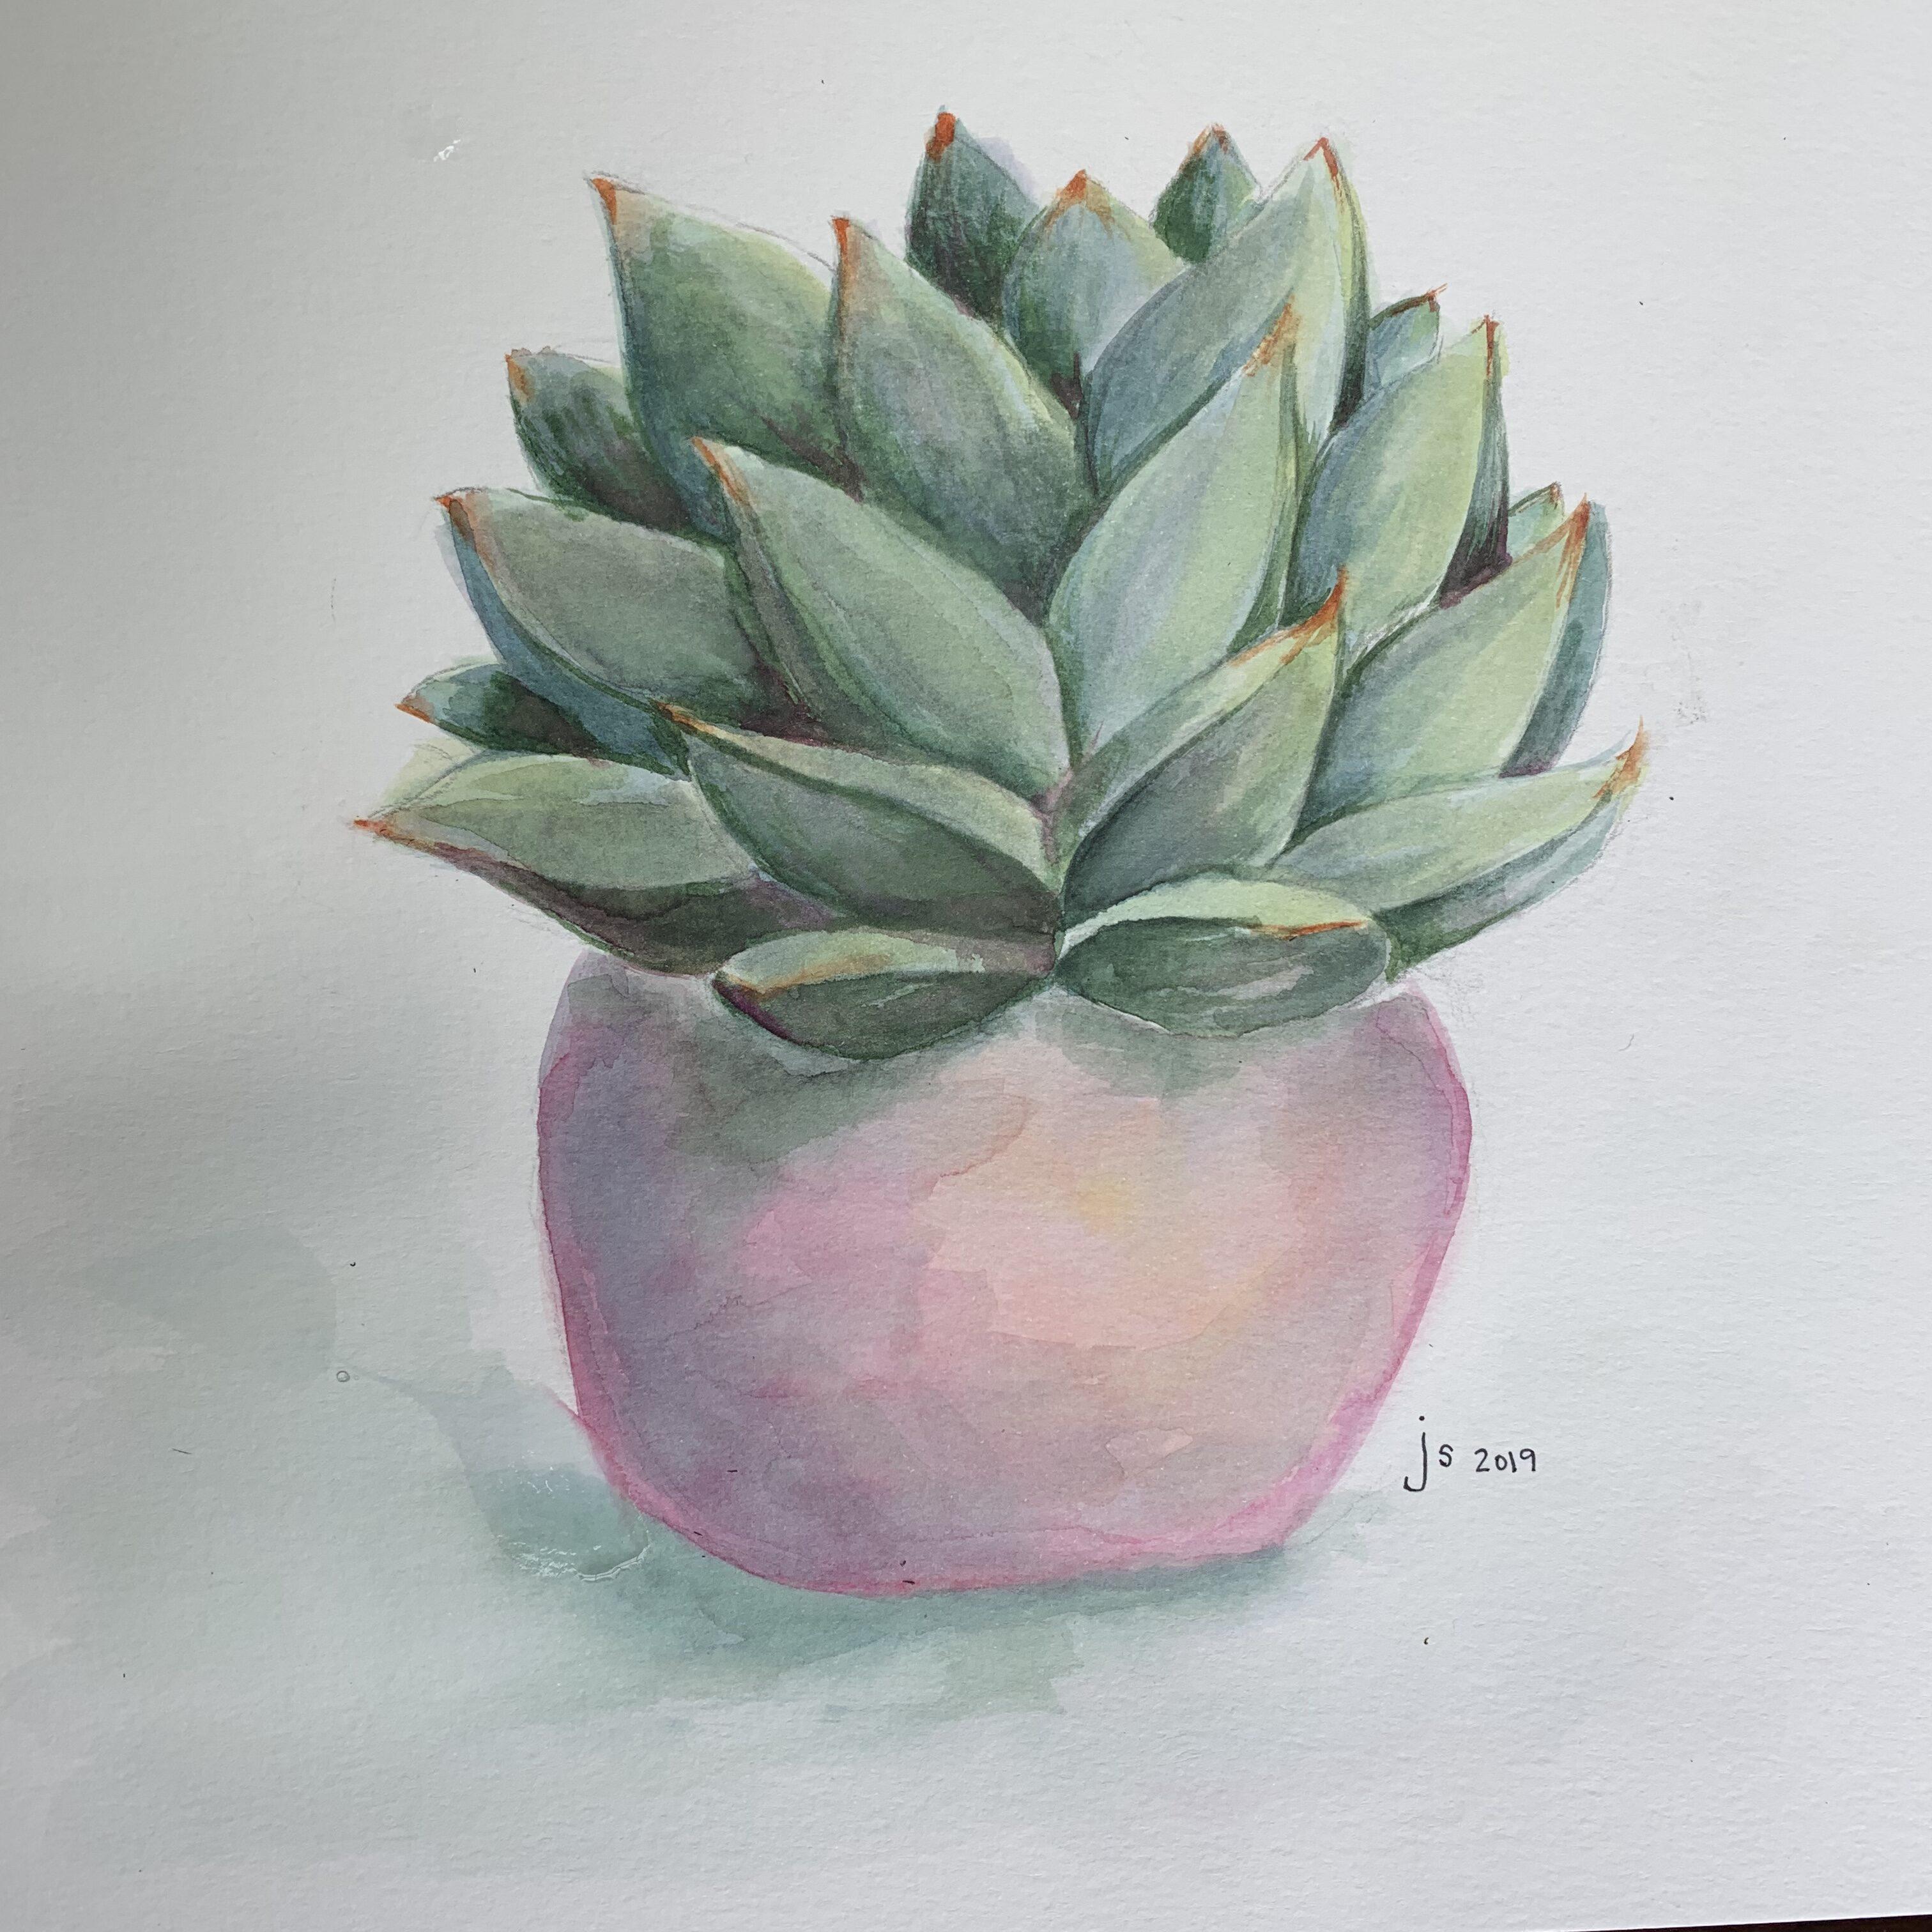 C41A9BA1 317F 4328 8FCF 32C9A1E34B61 Succulent in a pink pot